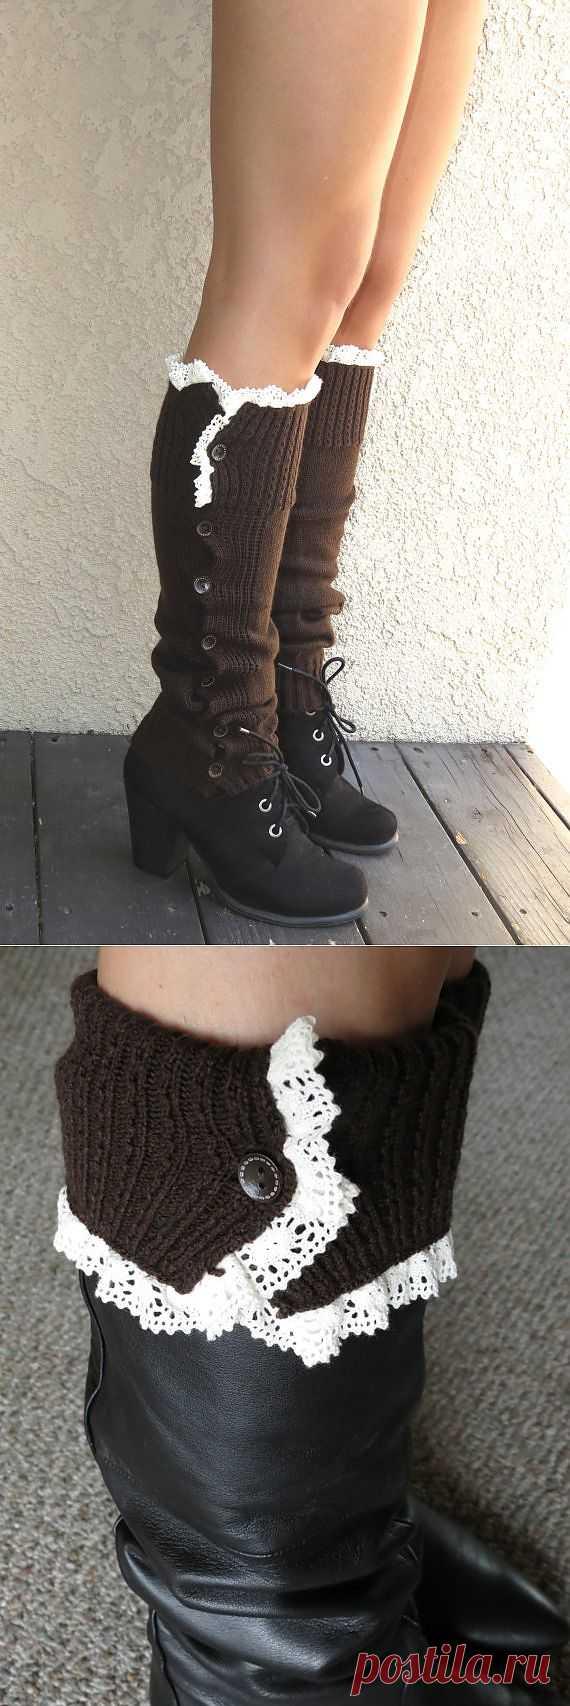 Brown Open Crochet Knit Leg Warmers Boot by DesignerScarvesWorld